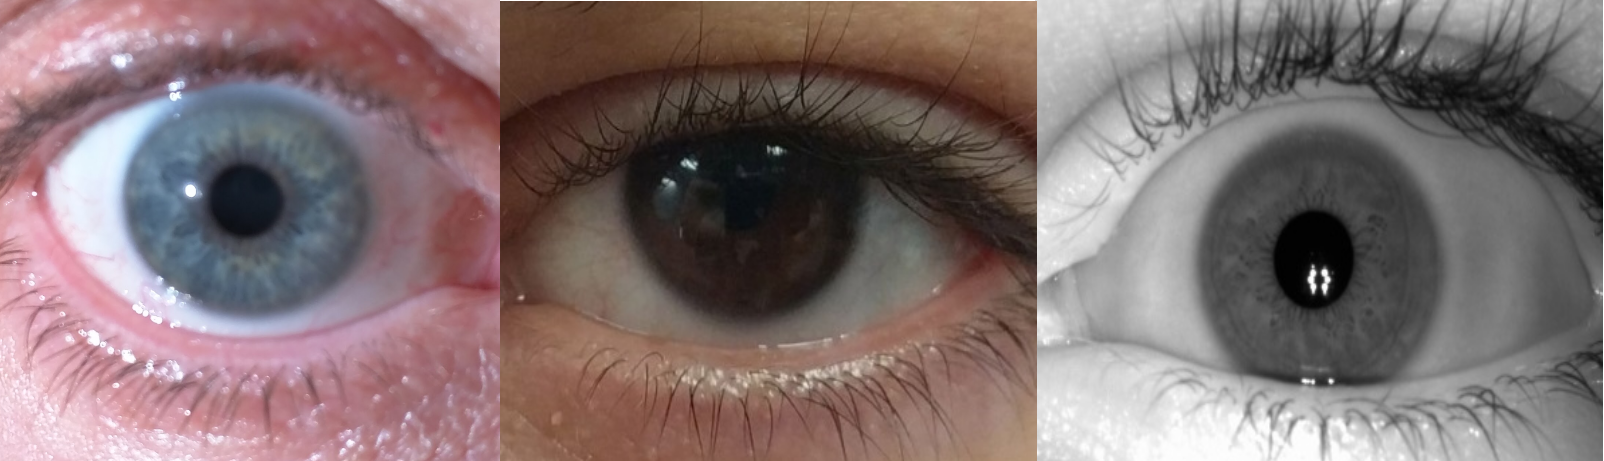 Light irises show a lot of detail. Dark eyes have less detail. An iris under NIR illumination shows great detail despite the lack of color.